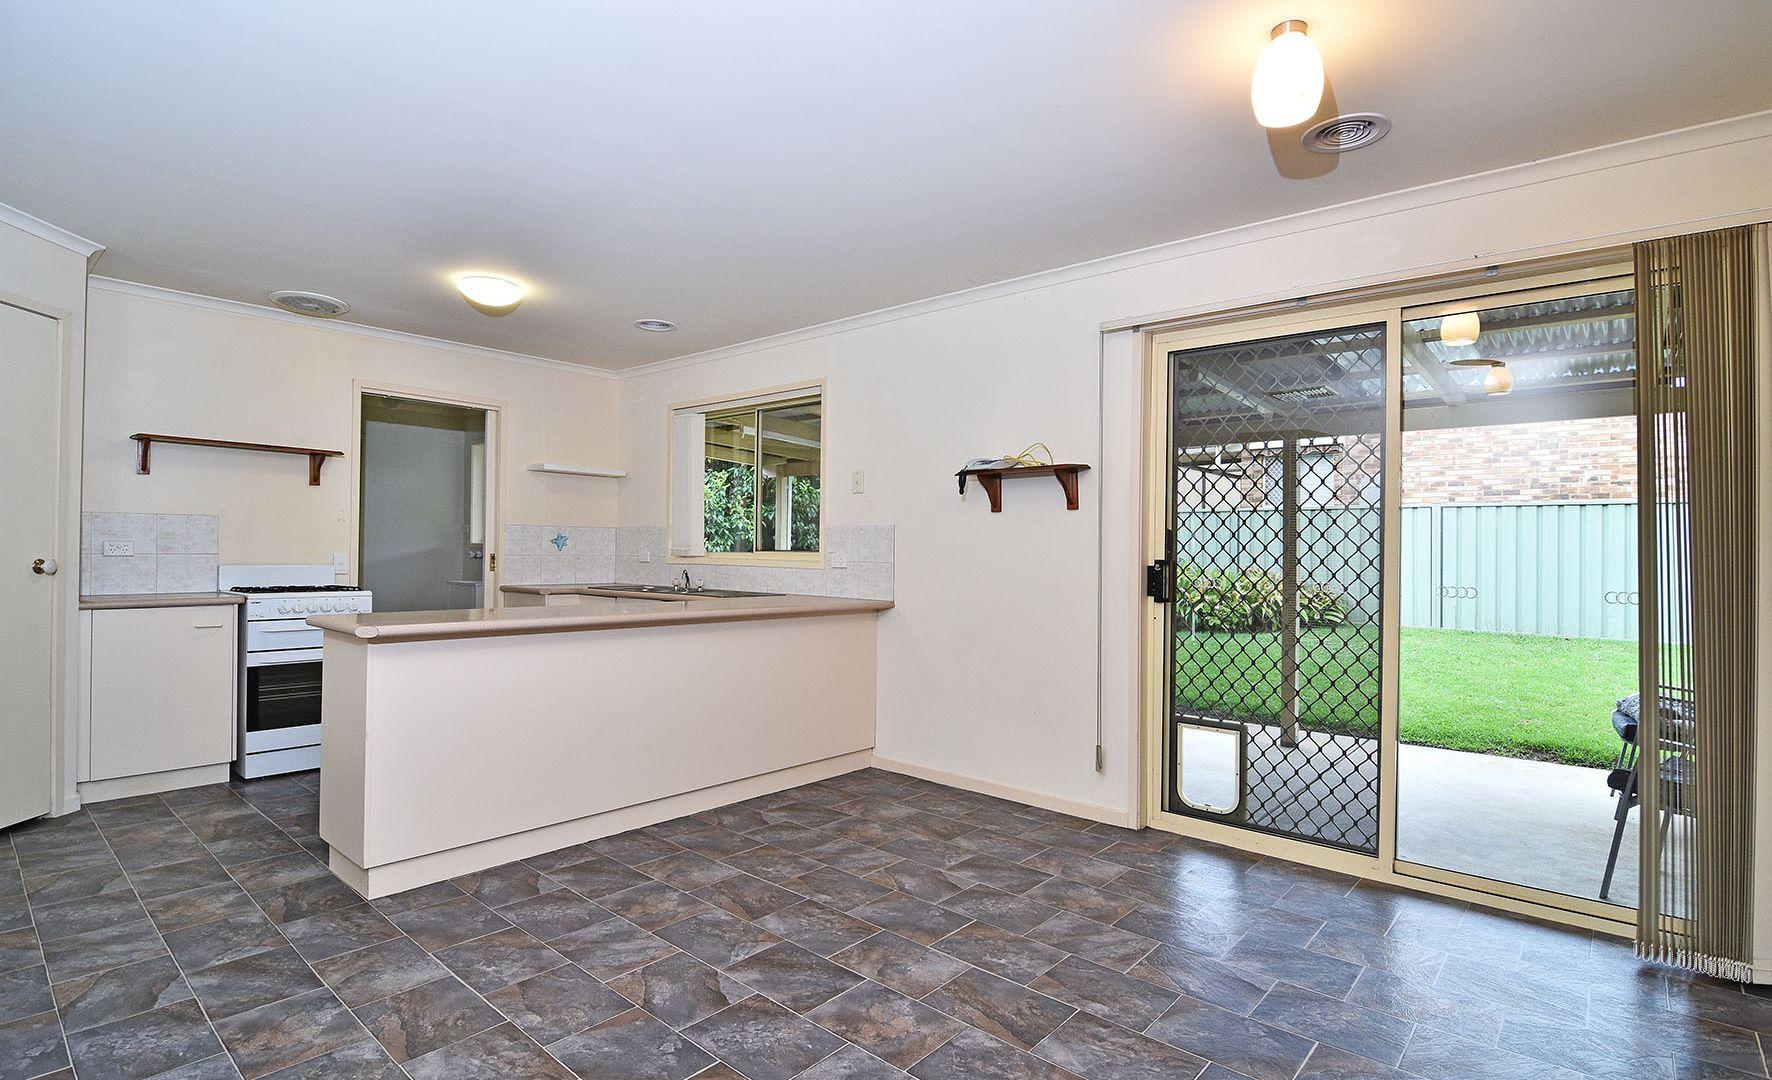 18 Creasey Place, Glenroy NSW 2640, Image 1